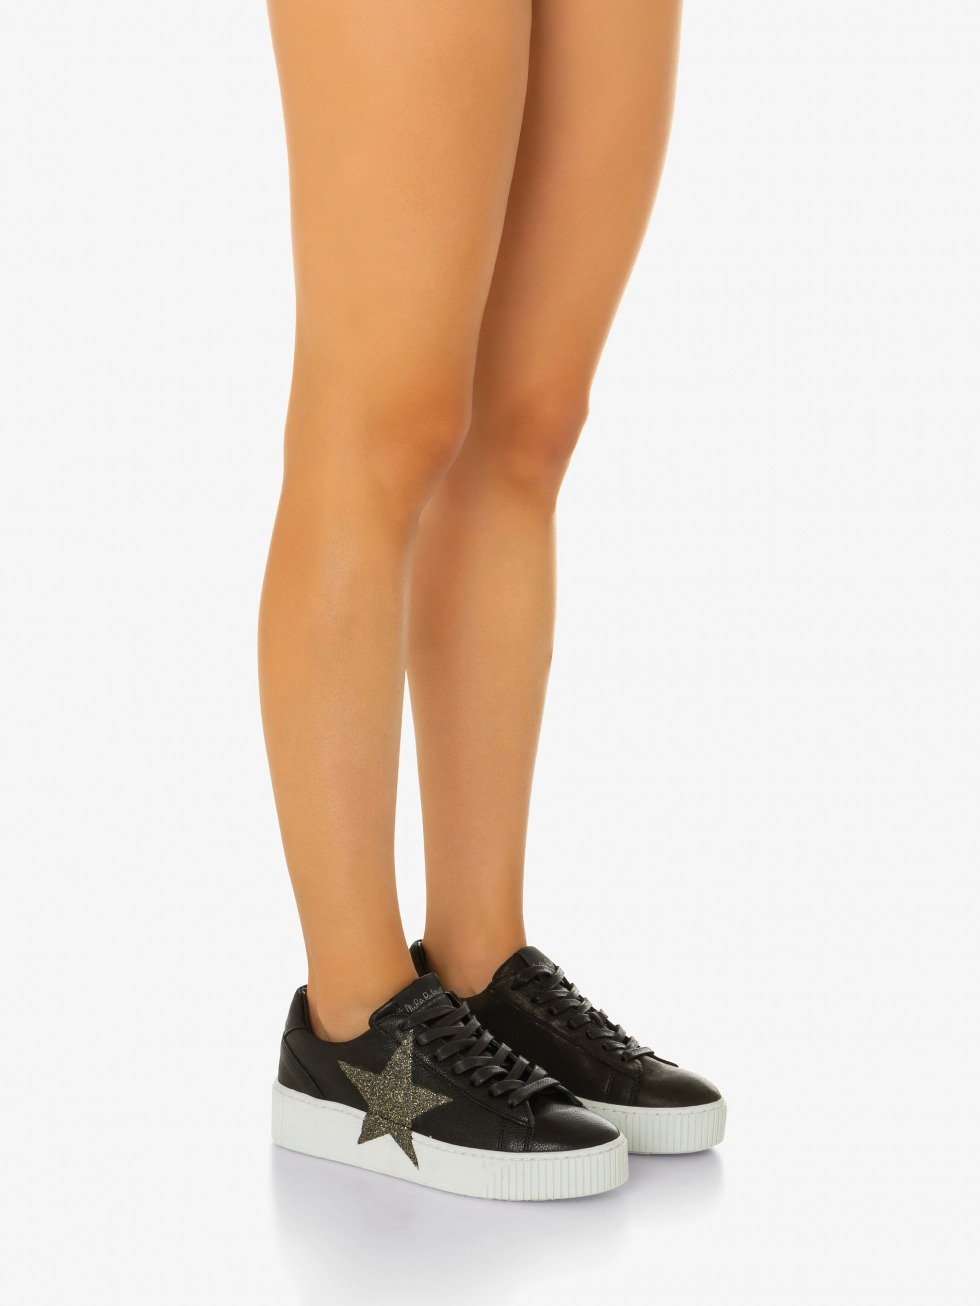 Sneakers Cosmopolitan Meteorite Glitter - Stella